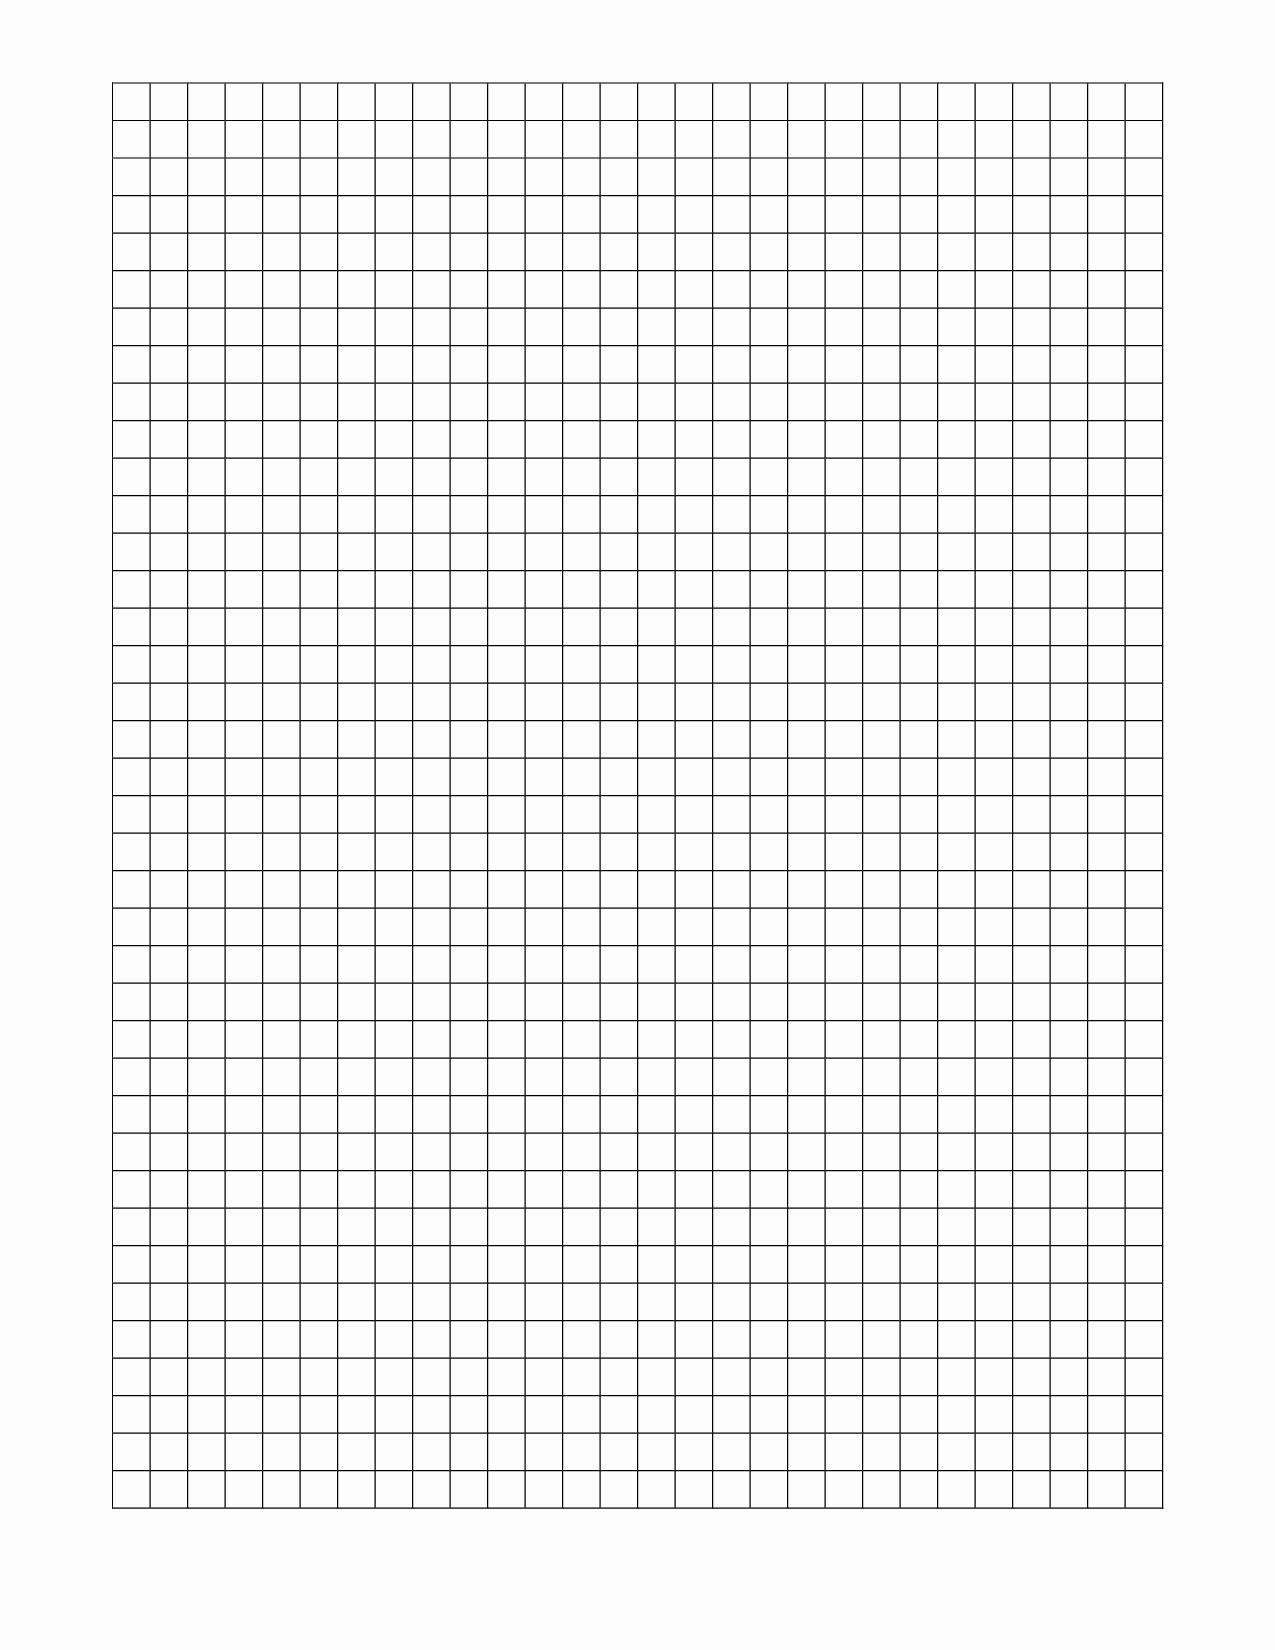 Create Graph Paper In Excel Elegant Make Graph Paper In Excel 2013 Printable Graph Paper and